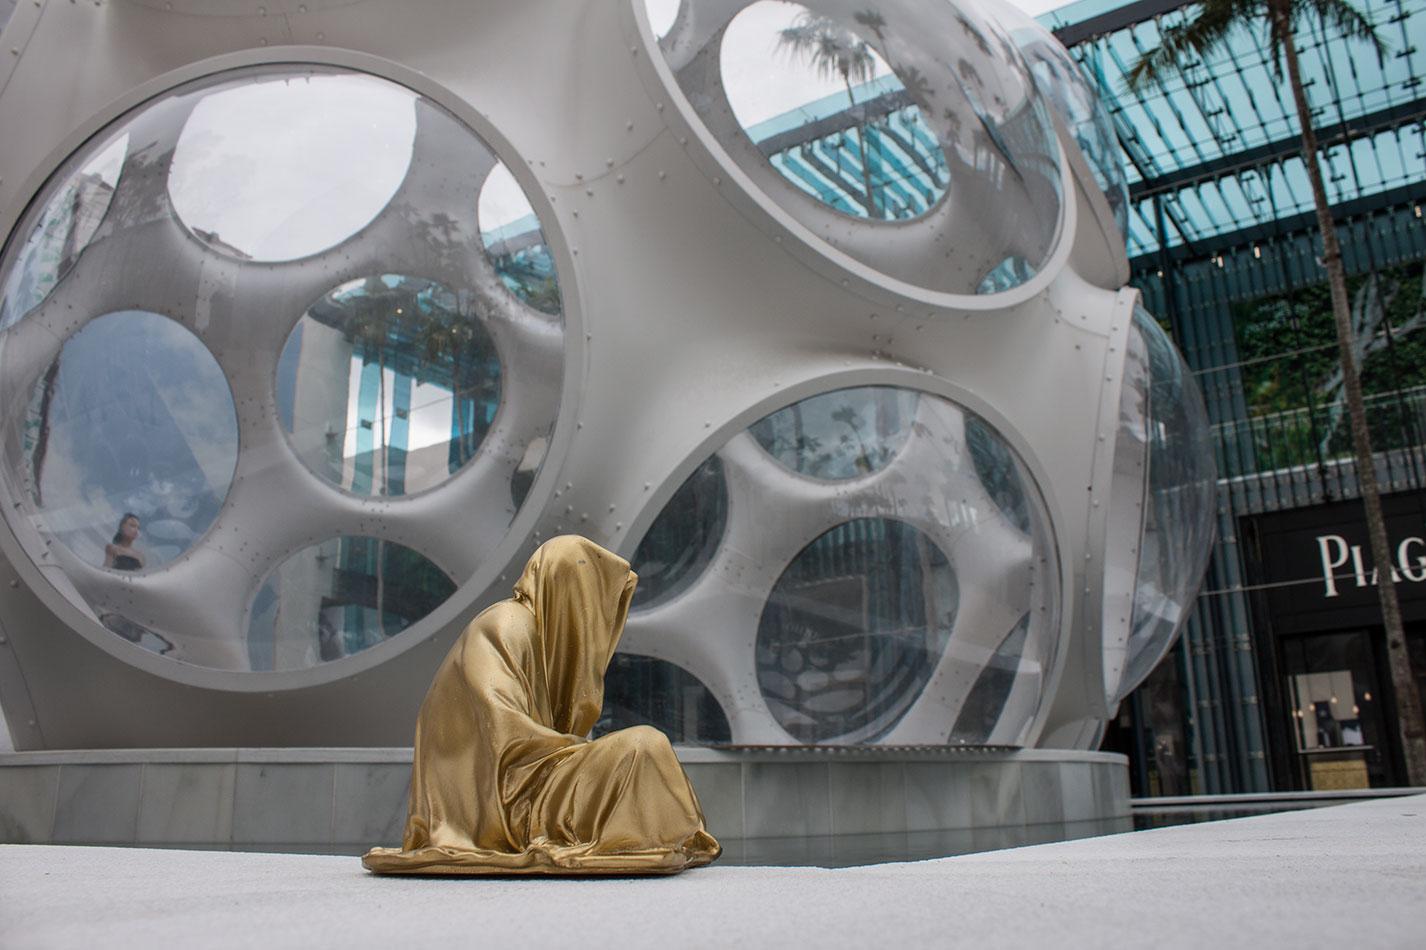 public-art-basel-miami-beach-fair-usa-florida-bass-museum-guardians-of-time-manfred-kili-kielnhofer-contemporary-fine-art-modern-arts-design-antiques-sculpture-6640